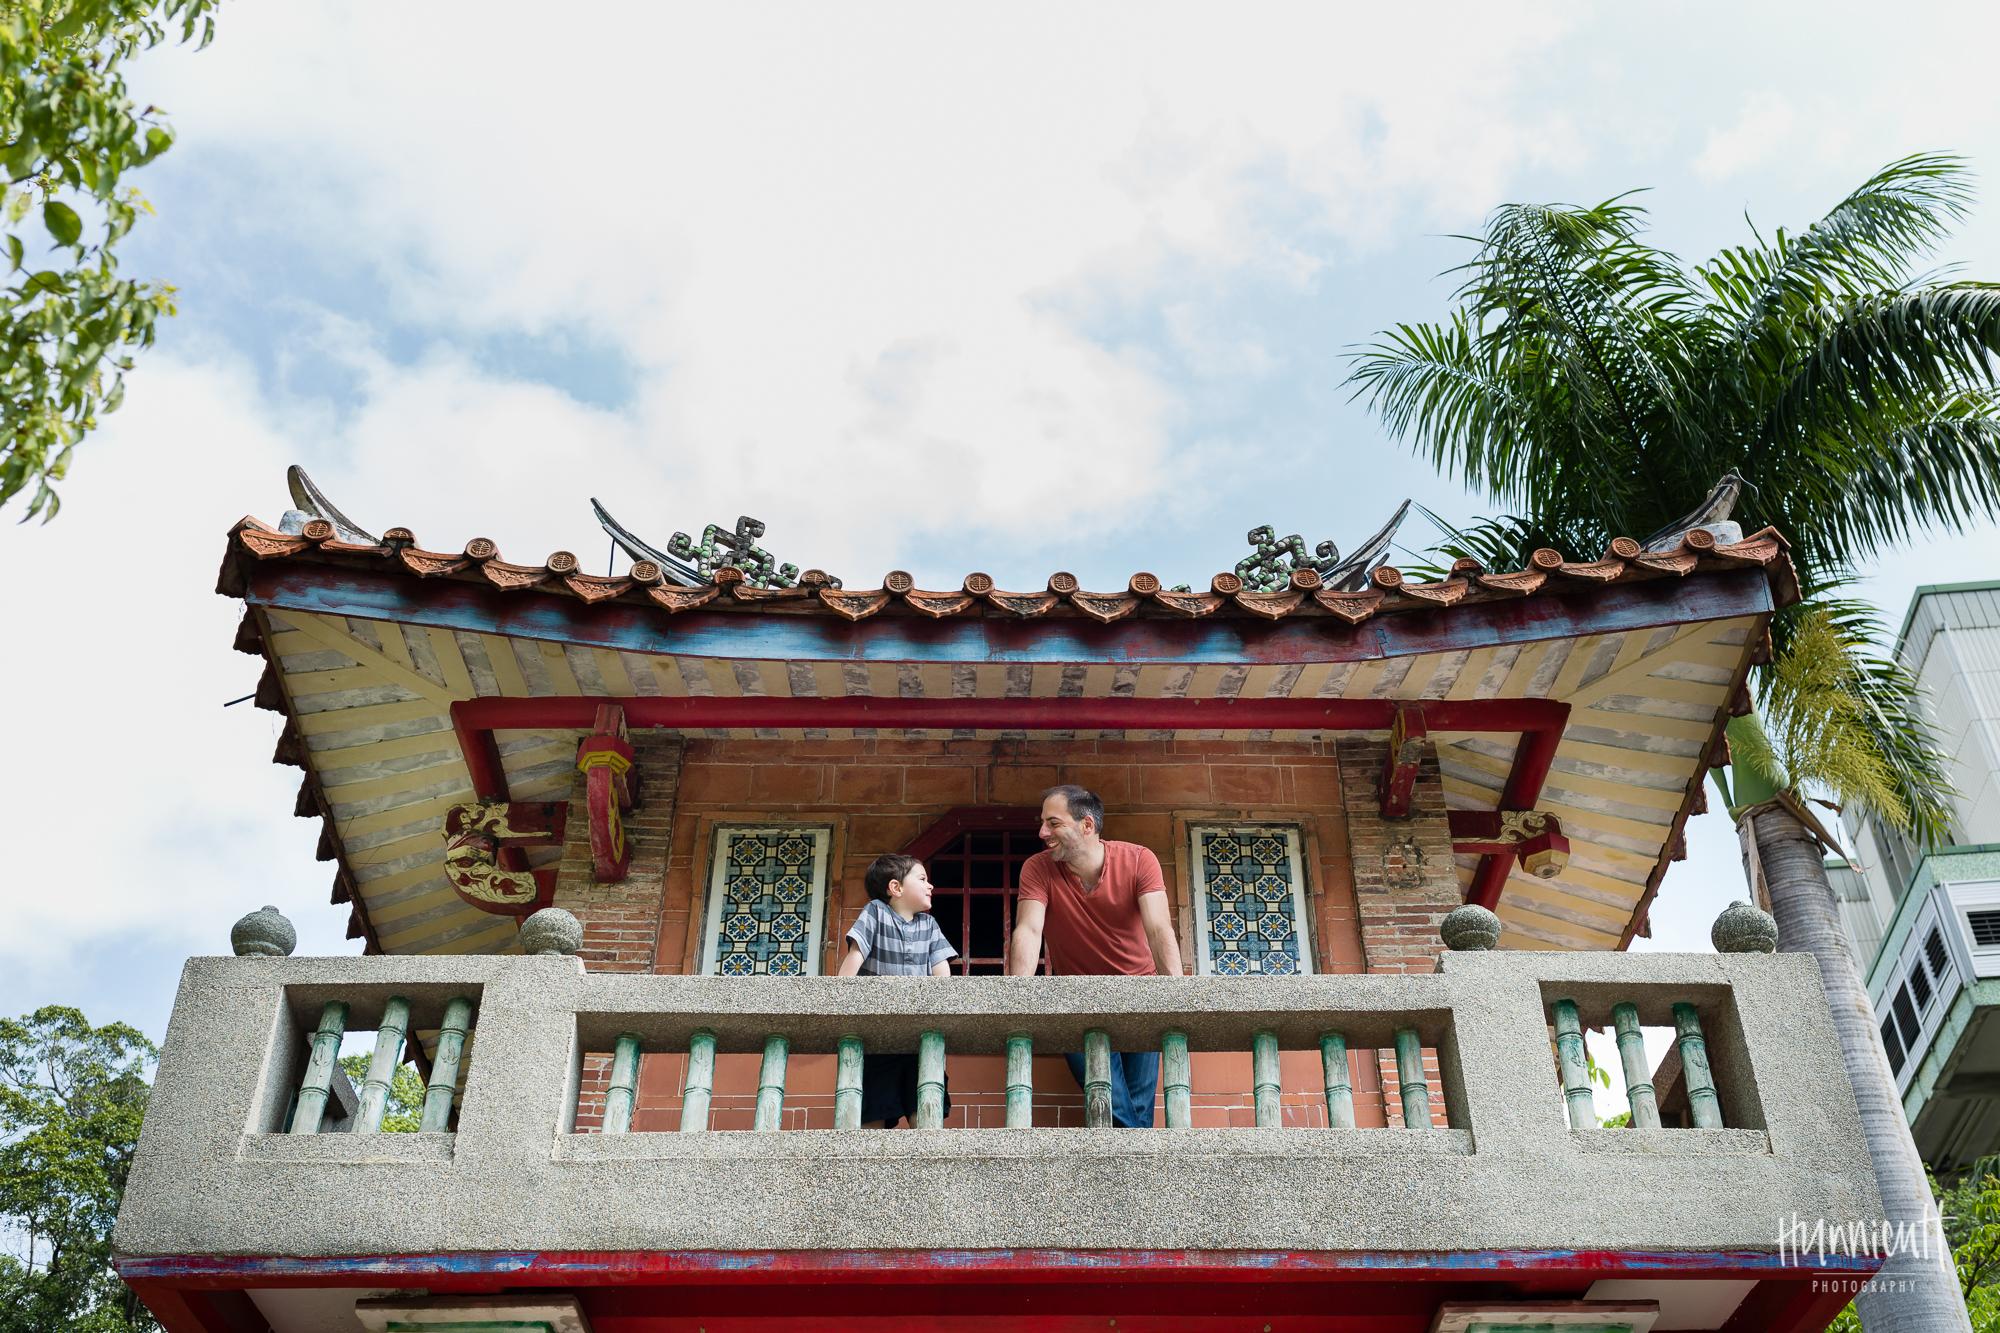 Family-Outdoor-Lifestyle-Modern-Urban-Travel-Culture-HunnicuttPhotography-RebeccaHunnicuttFarren-Taichung-Taiwan-4